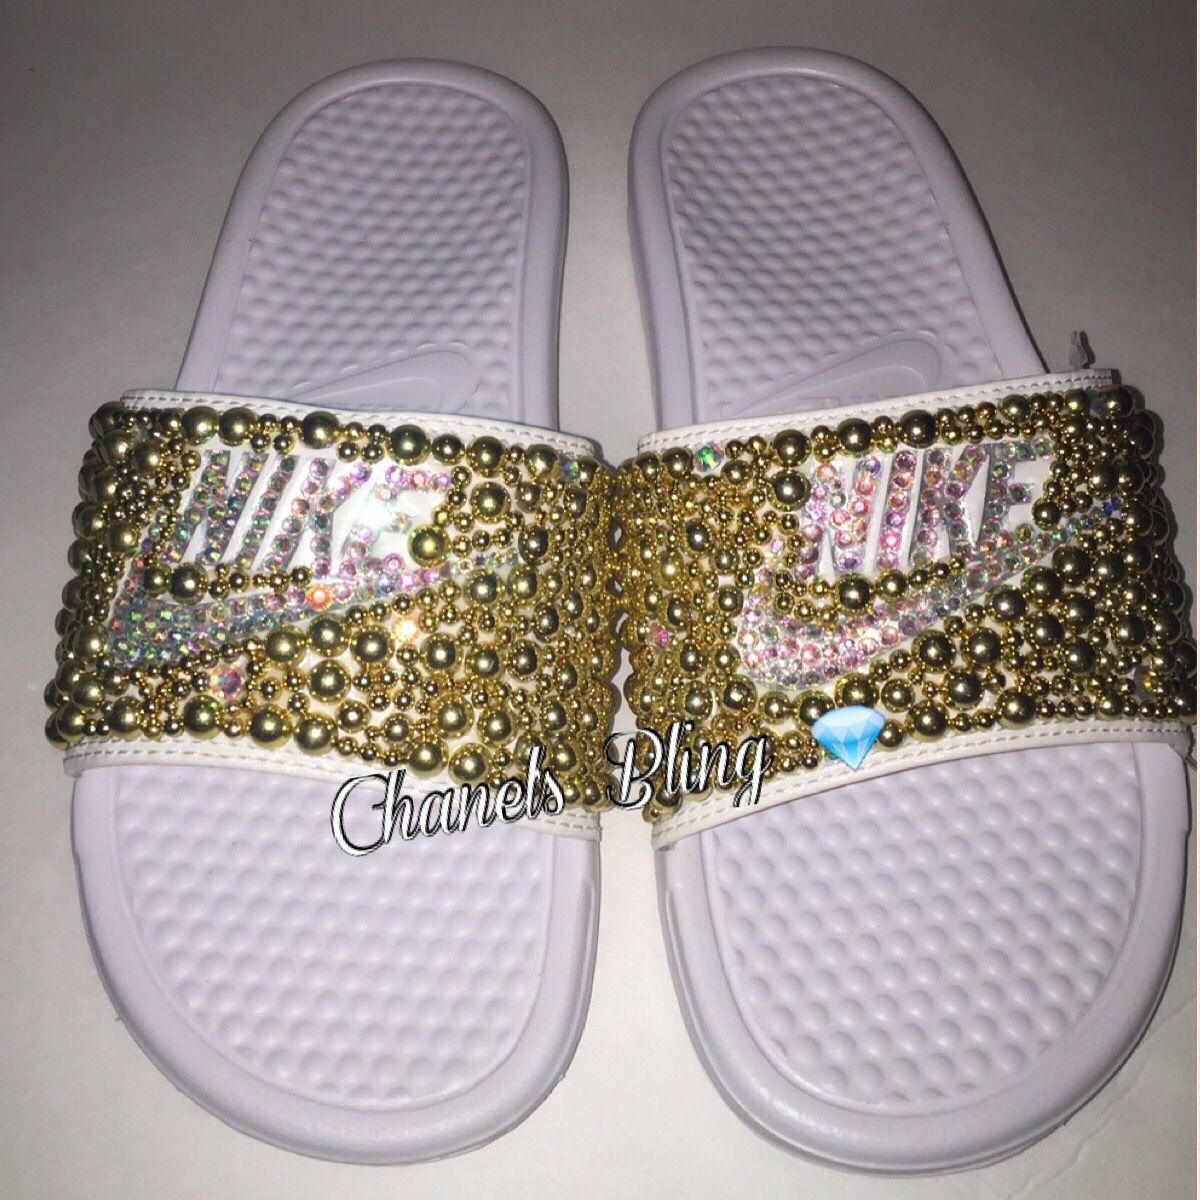 3b35a793e52a add me on facebook  Gullie Ella and follow me   Baithielacoen Nike Flip  Flops